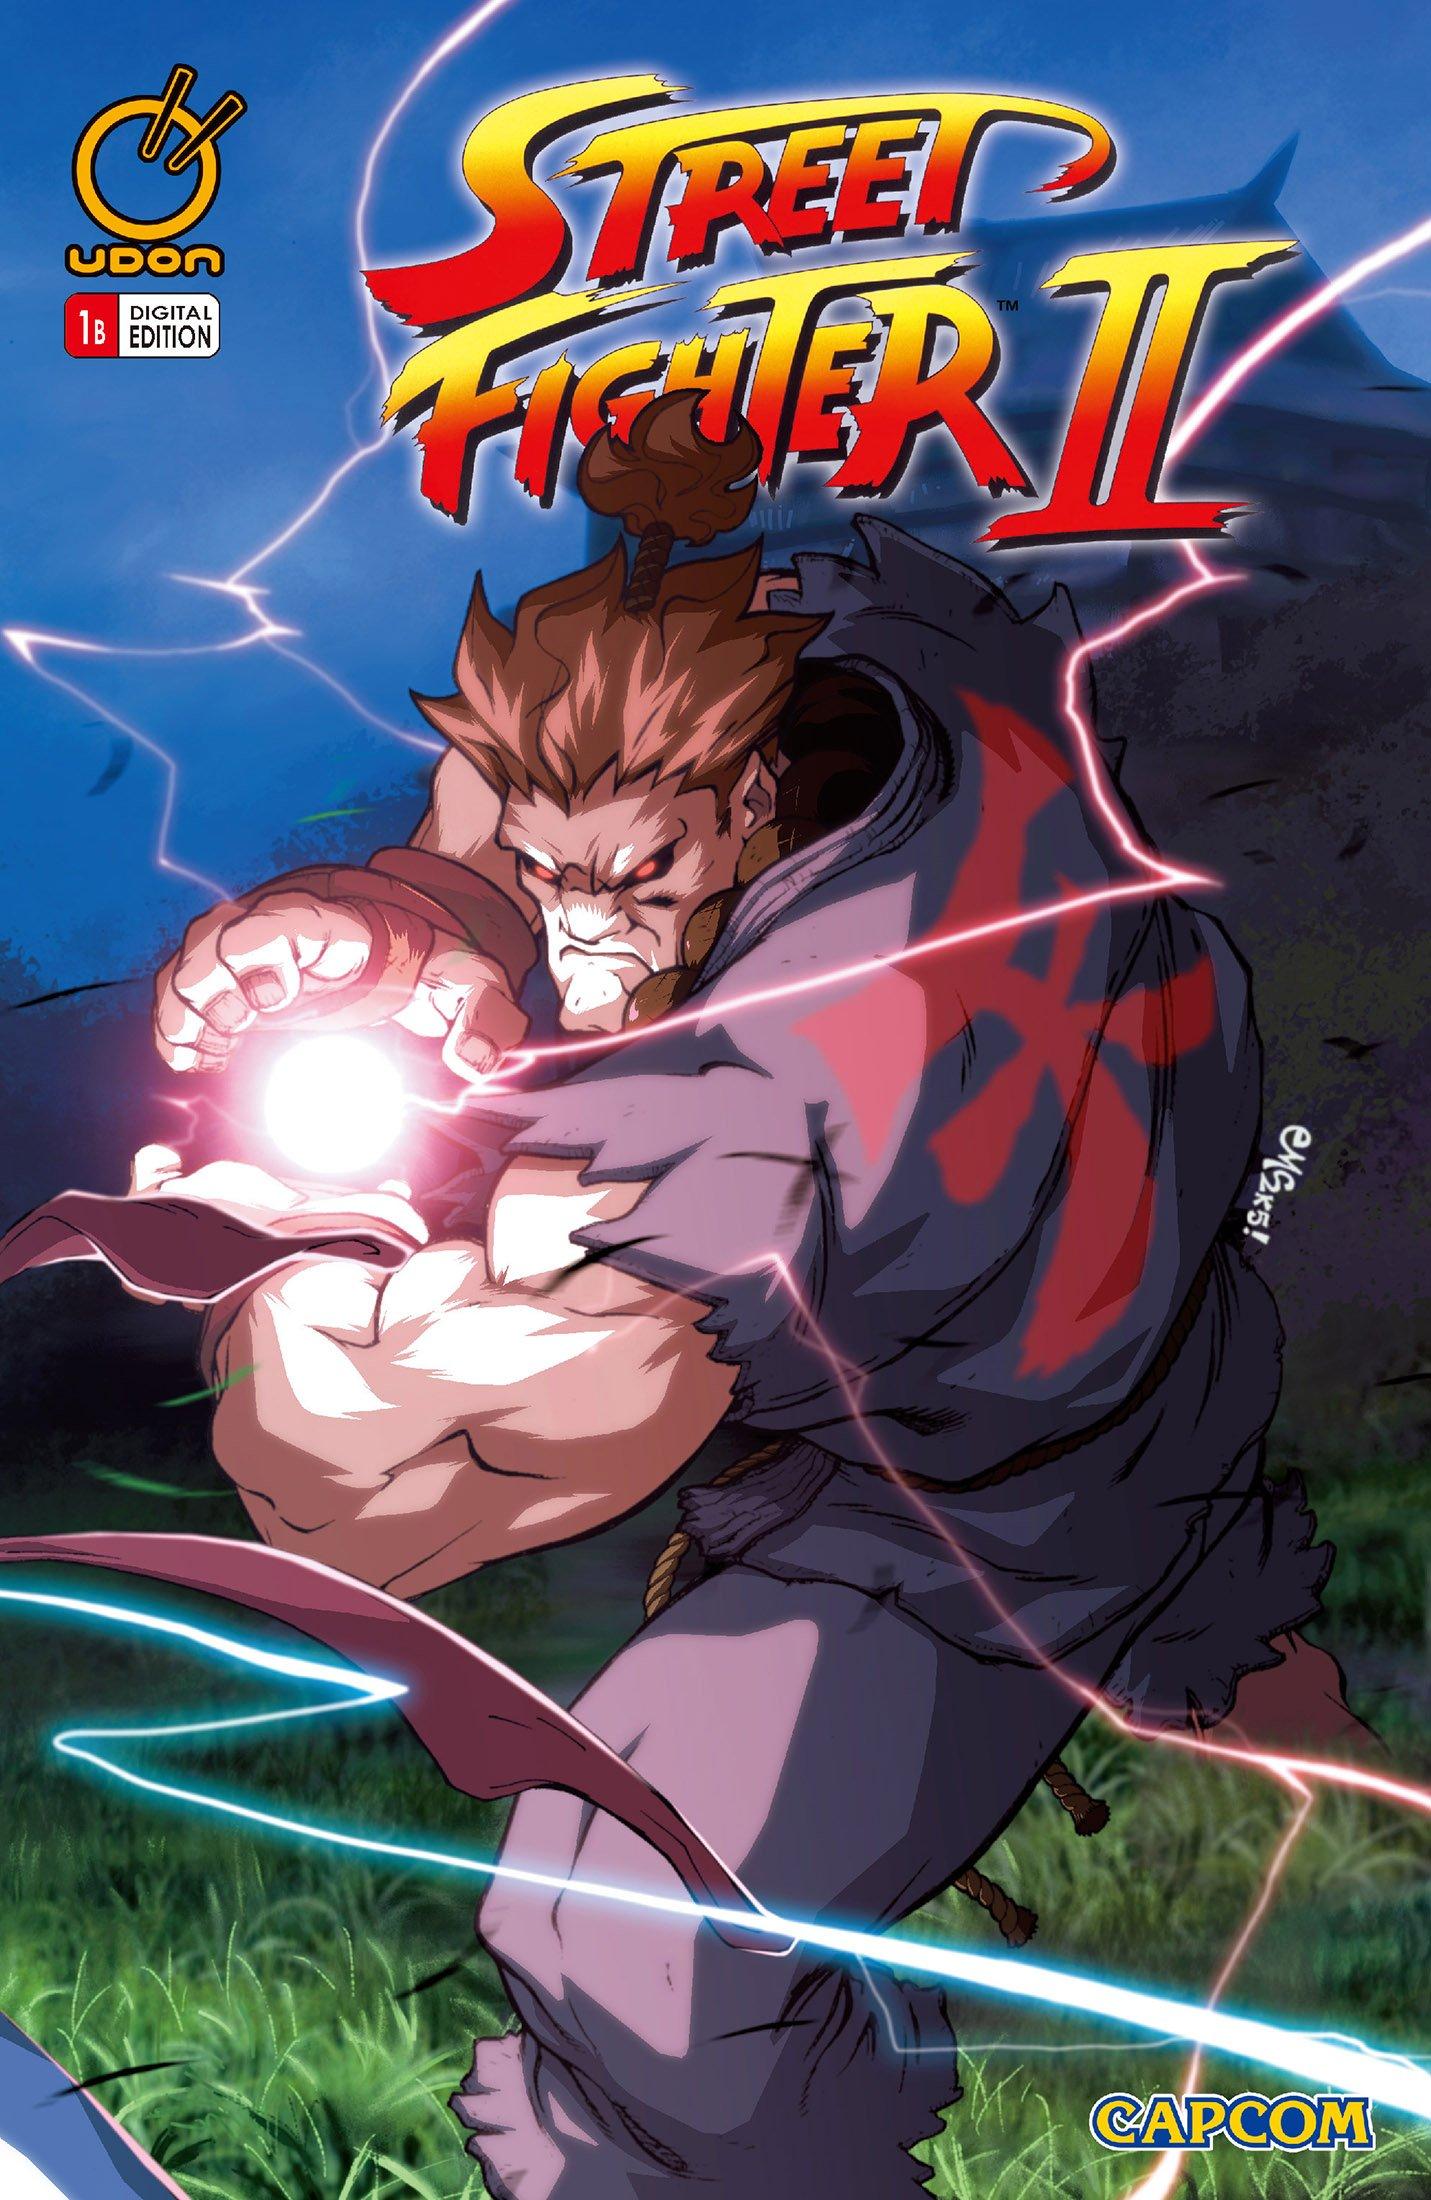 Street Fighter II Issue 1 (November 2005) (cover b)